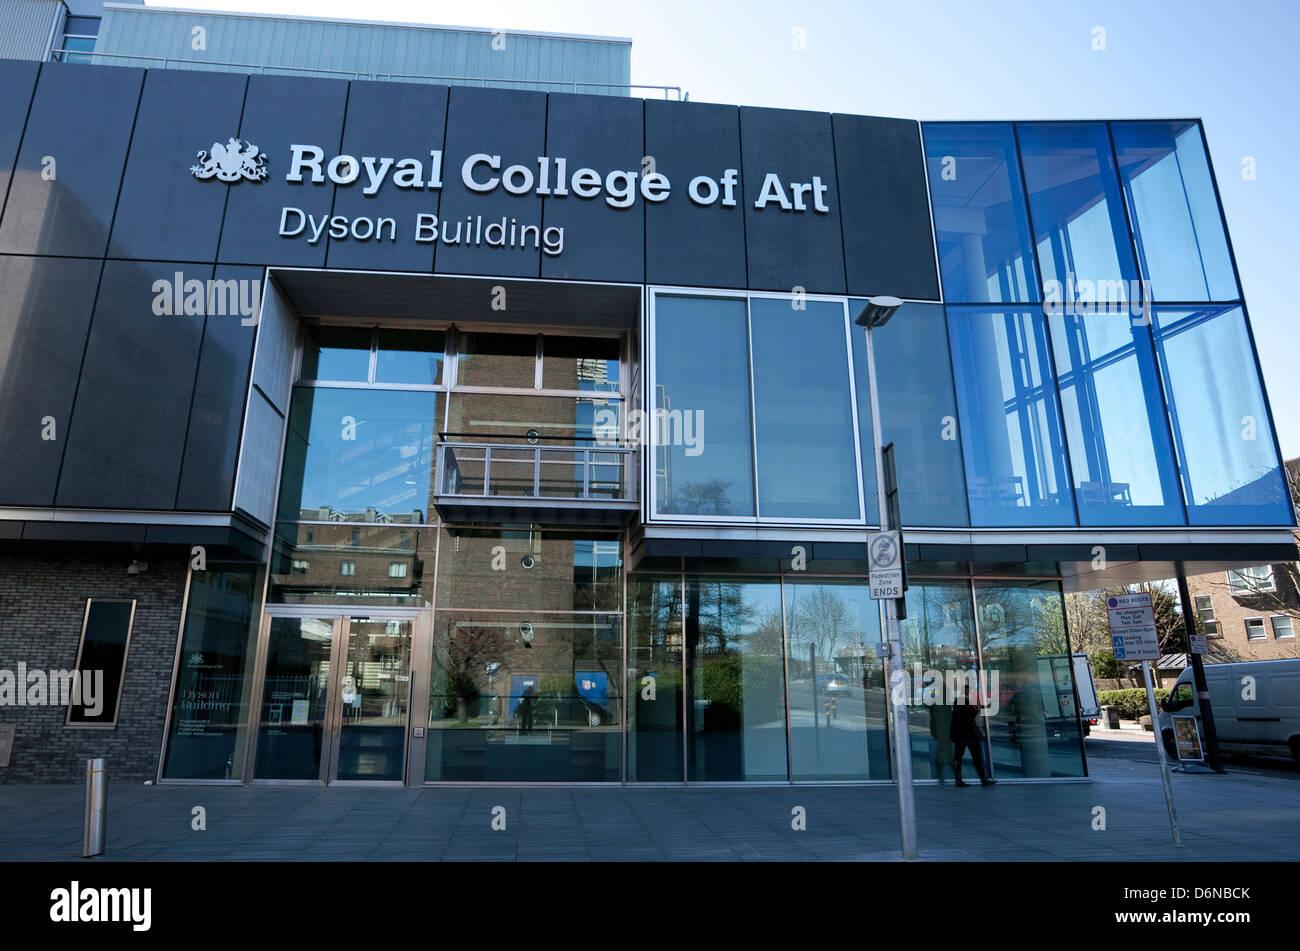 Royal College Of Art >> Royal College Of Art Dyson Building Battersea London Stock